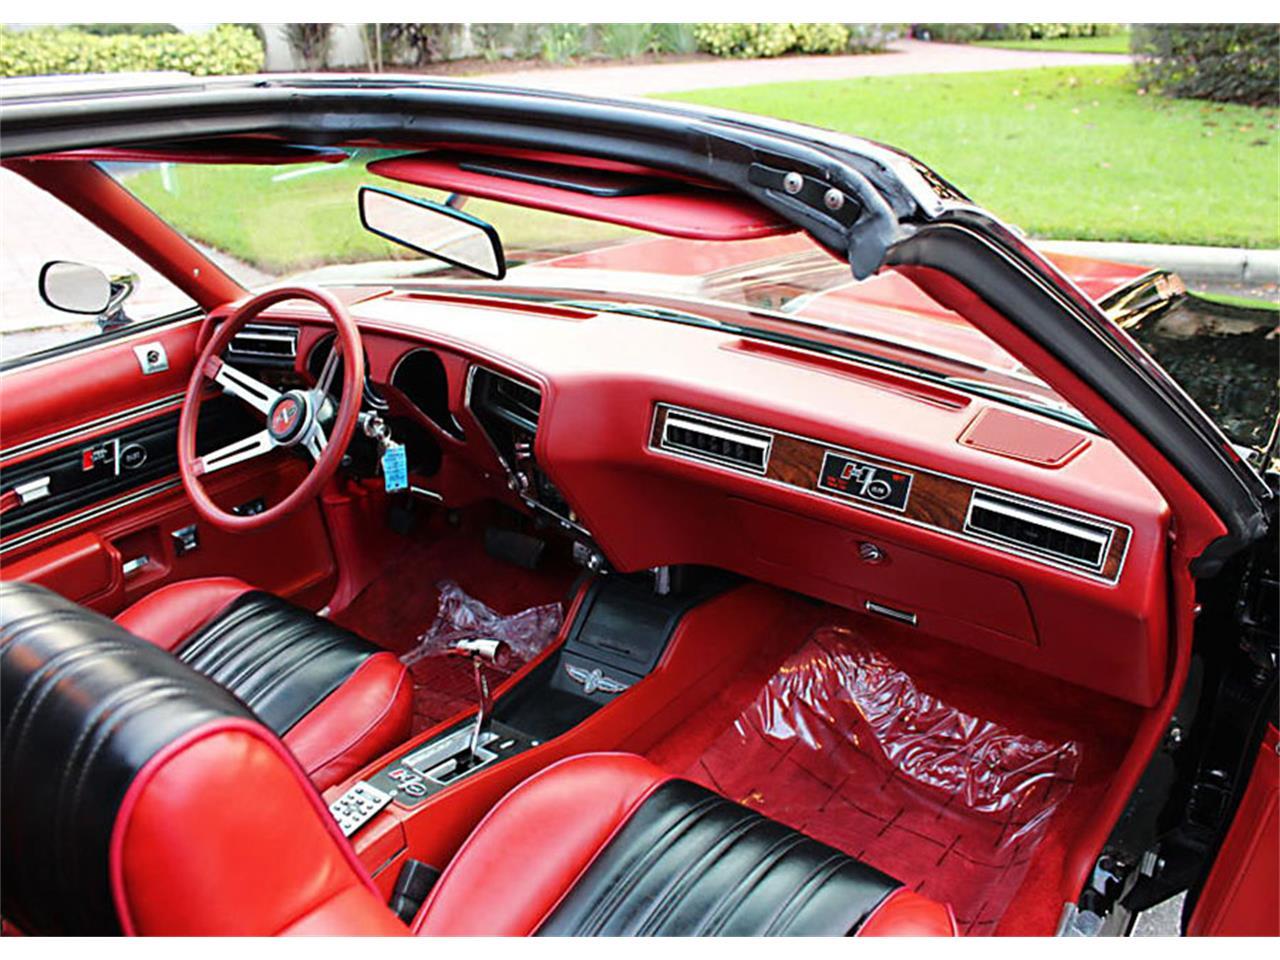 For Sale: 1977 Oldsmobile Cutlass in Lakeland, Florida